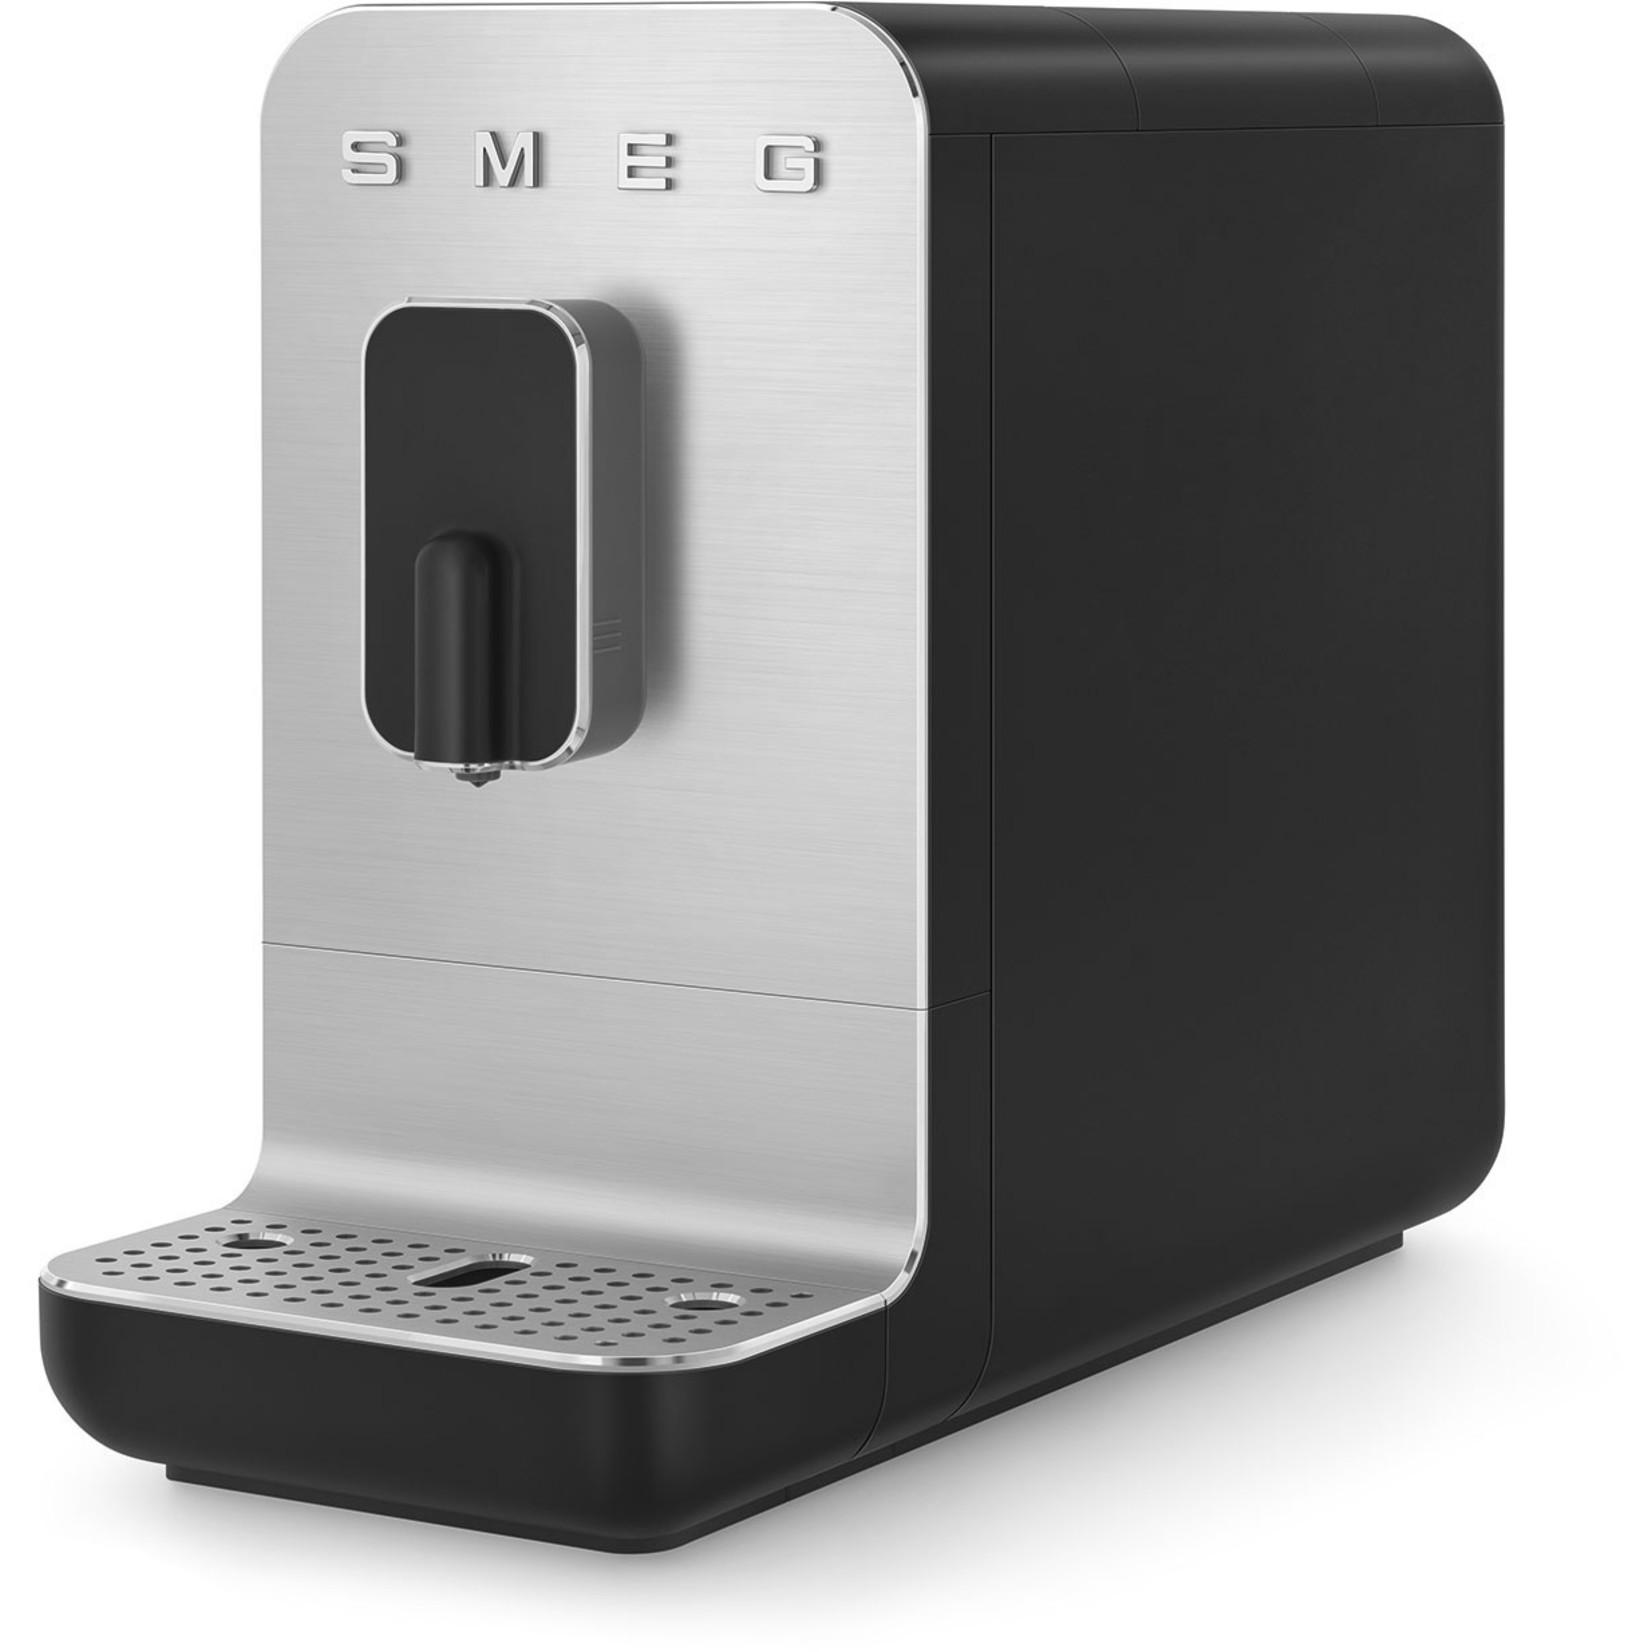 Smeg Smeg espressomachine basic, mat zwart